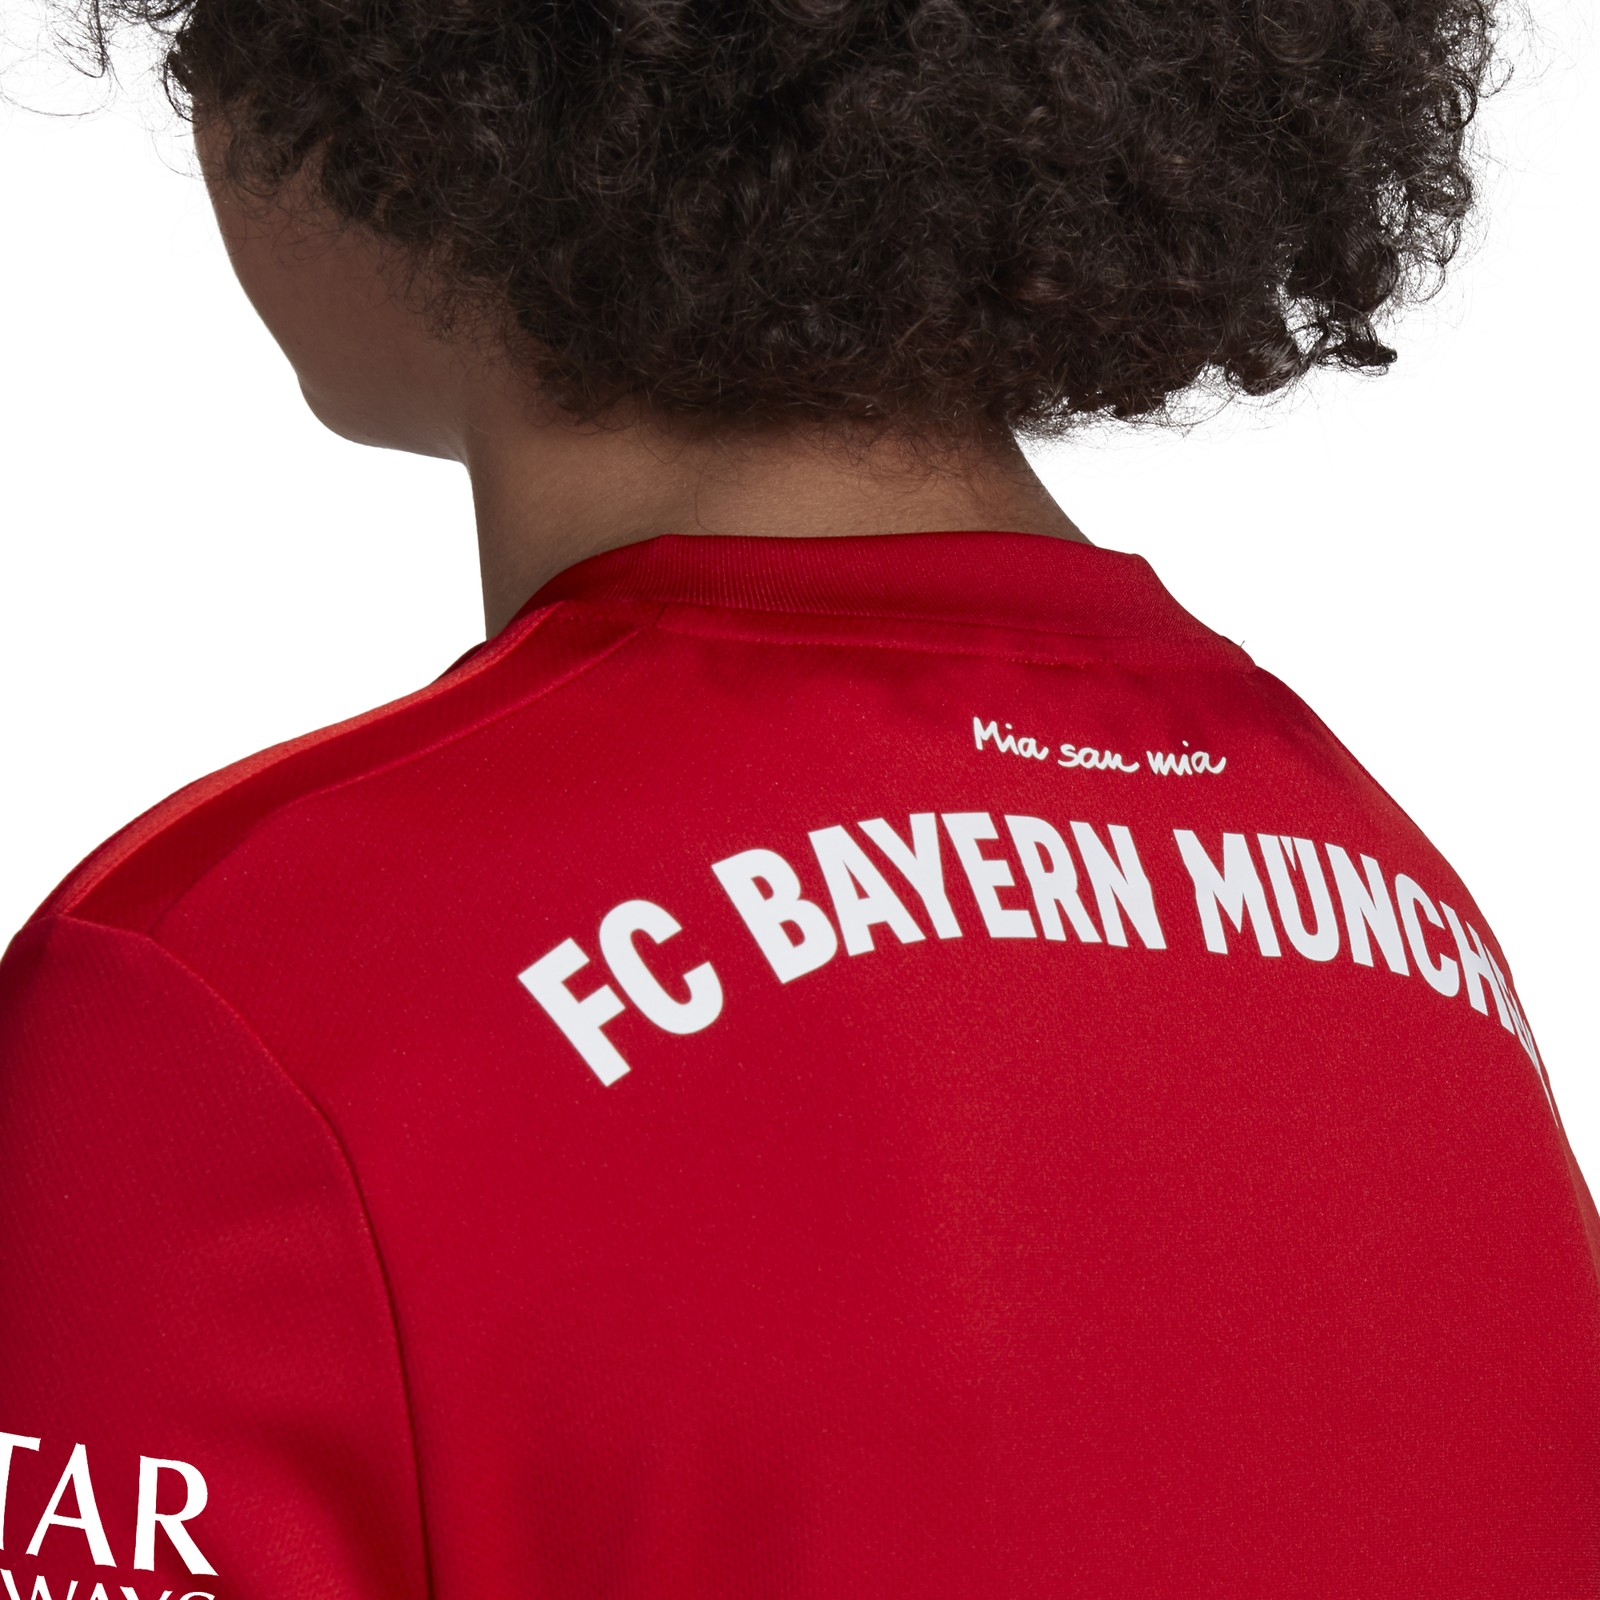 adidas-FC-Bayern-Muenchen-Heimtrikot-Kinder-2019-2020-Home-Jersey-rot-DX9253 Indexbild 19